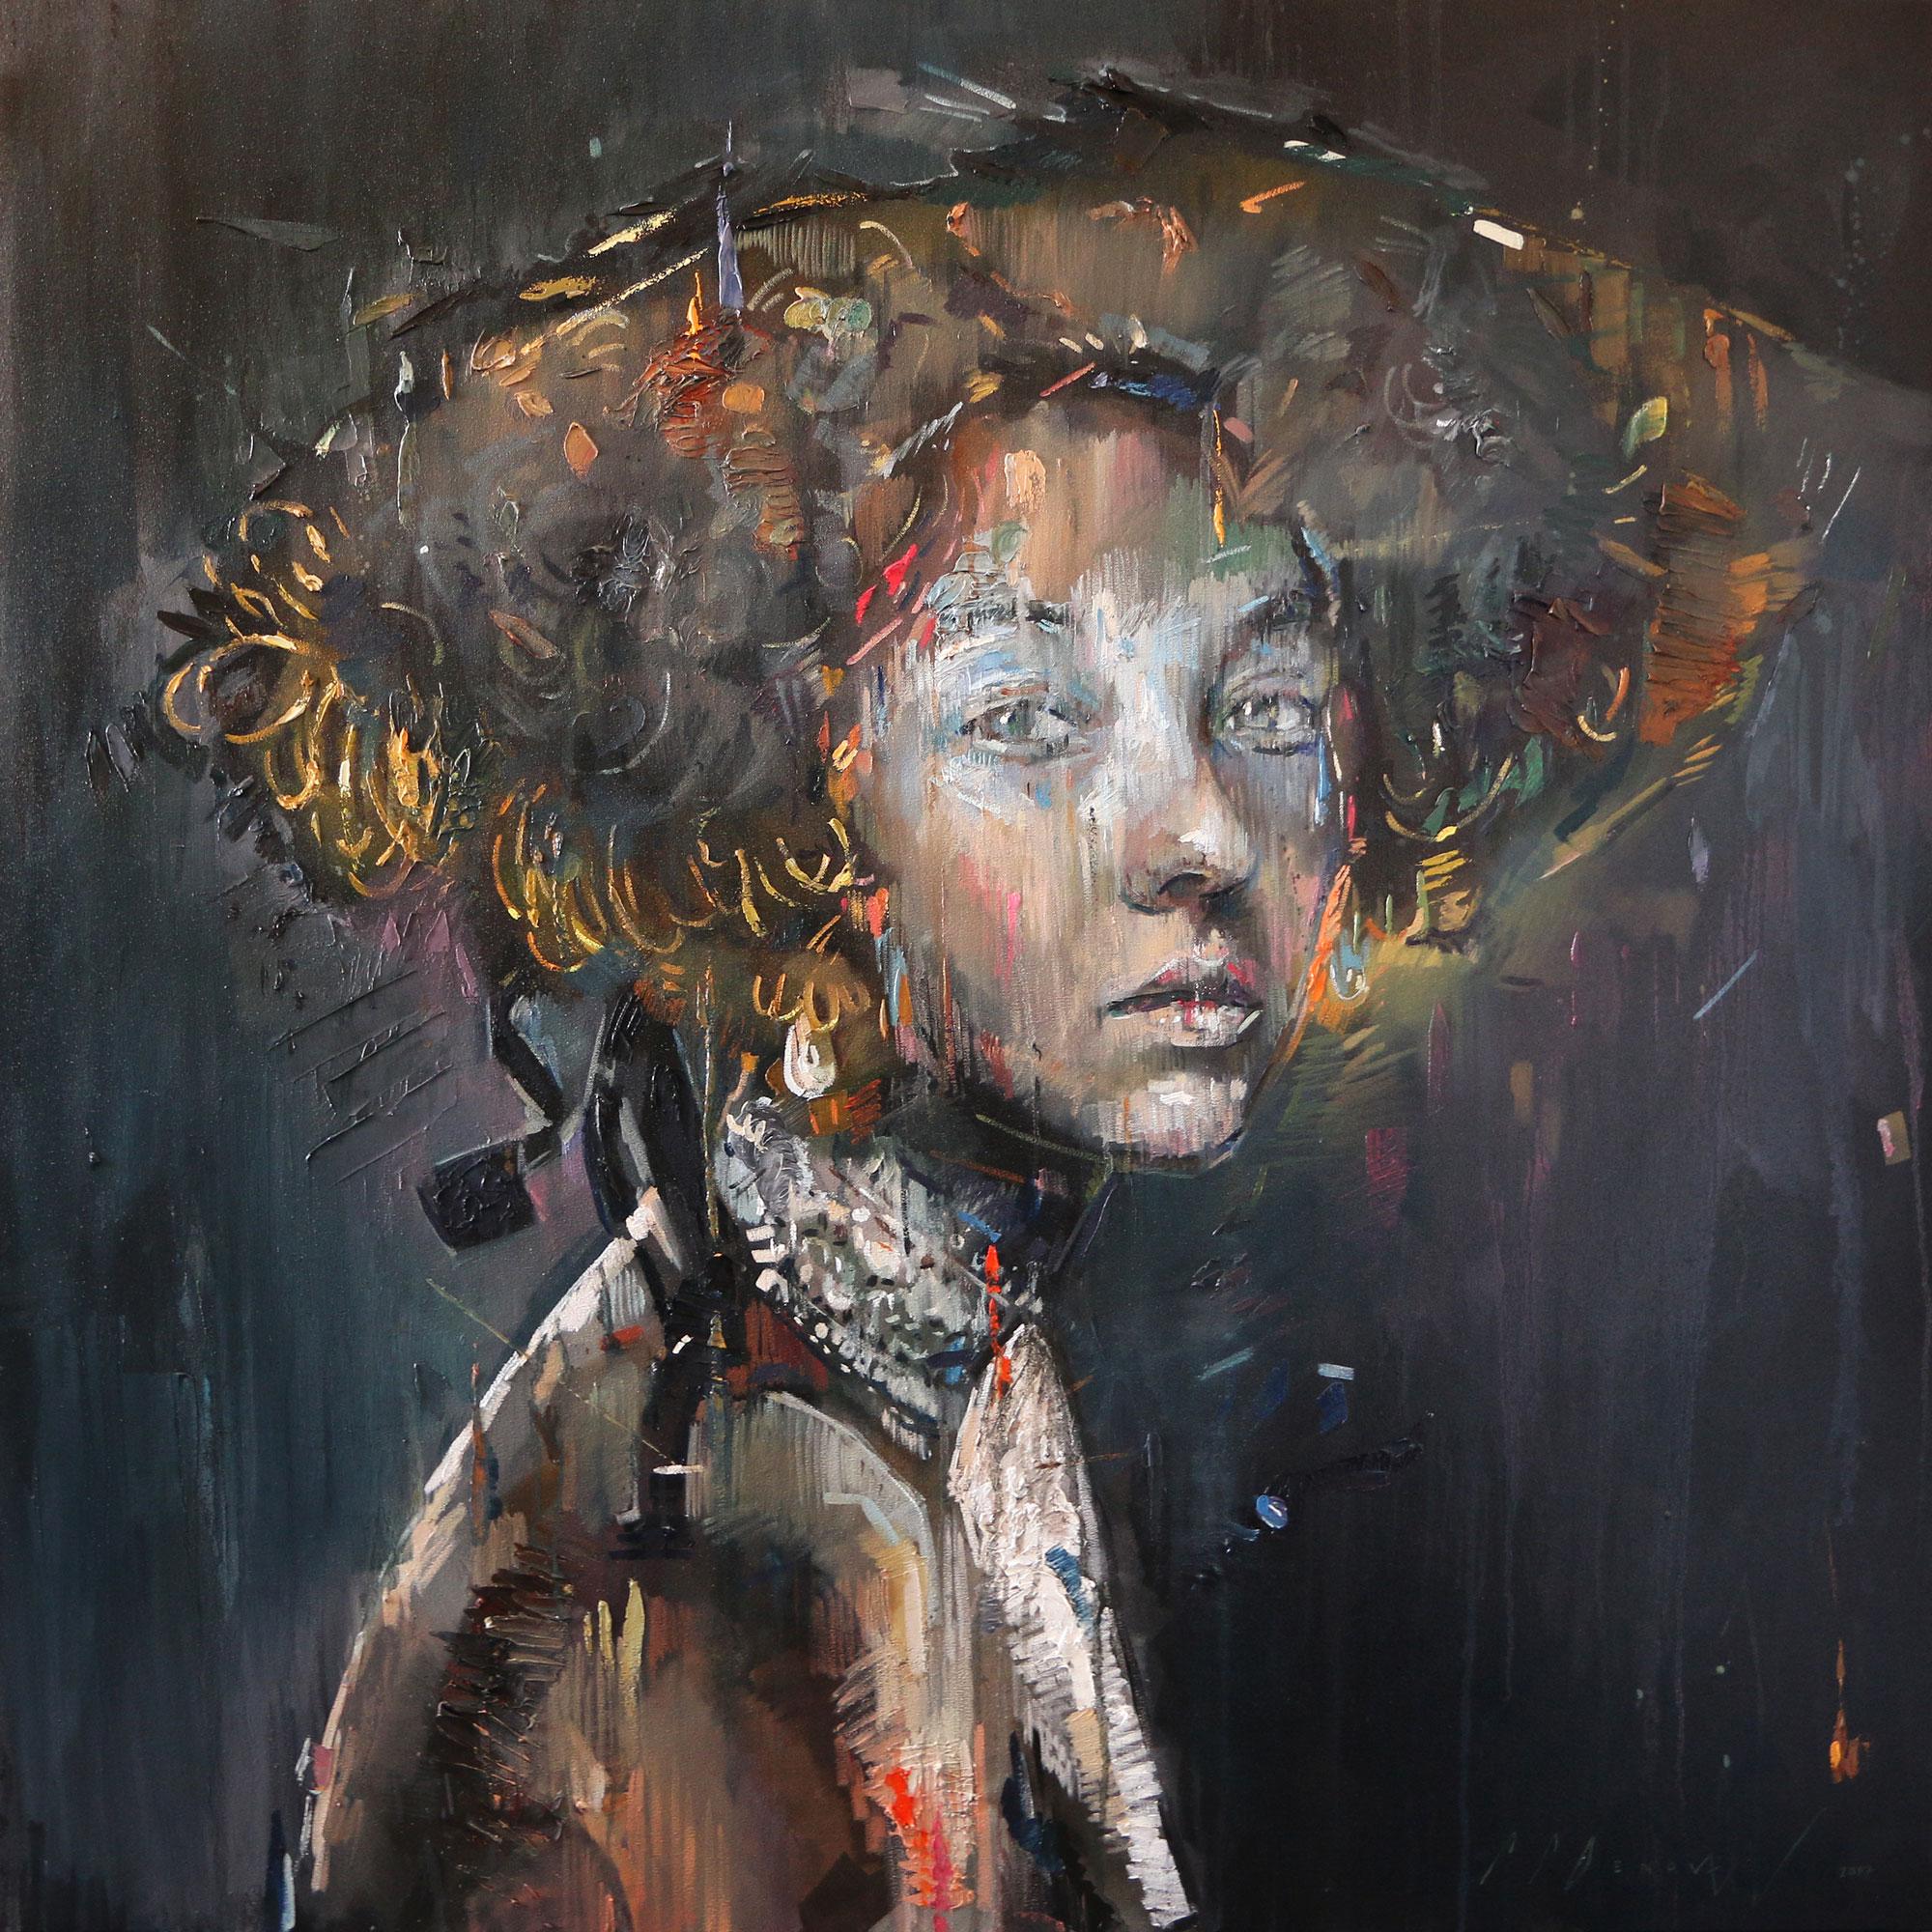 Descent (Crina Earls).  Oil on canvas.130cm x 130cm.